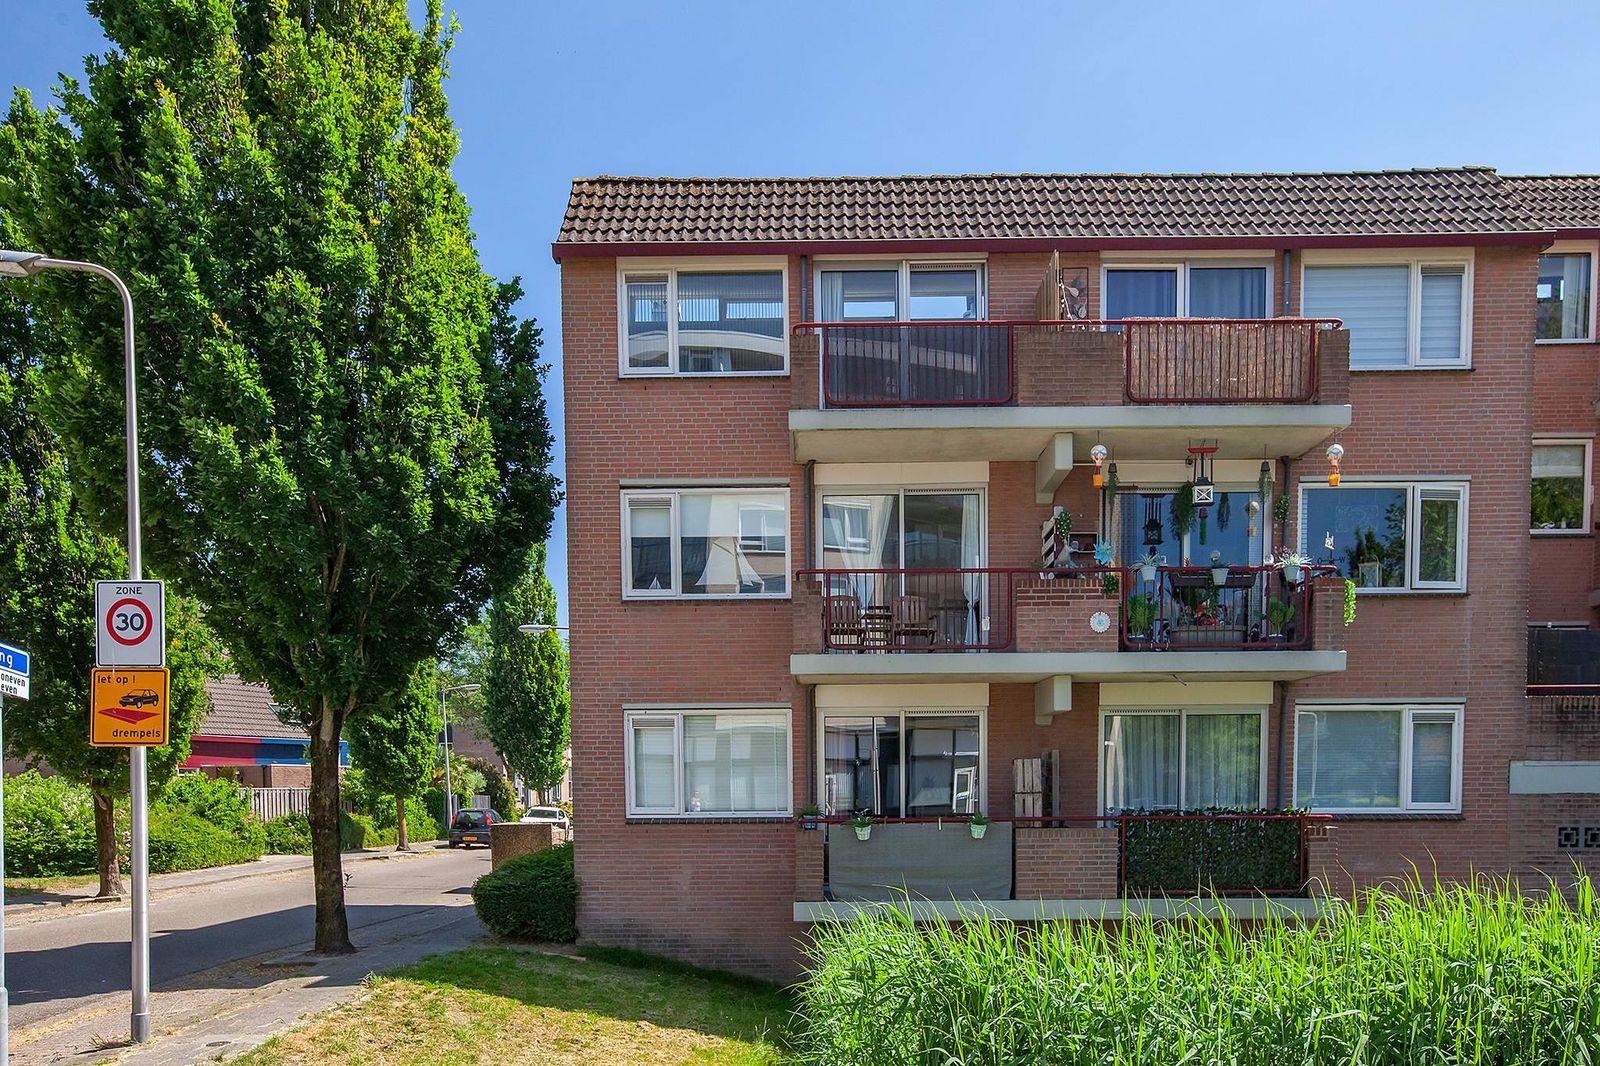 Pruylenborg 185, Hendrik-ido-ambacht